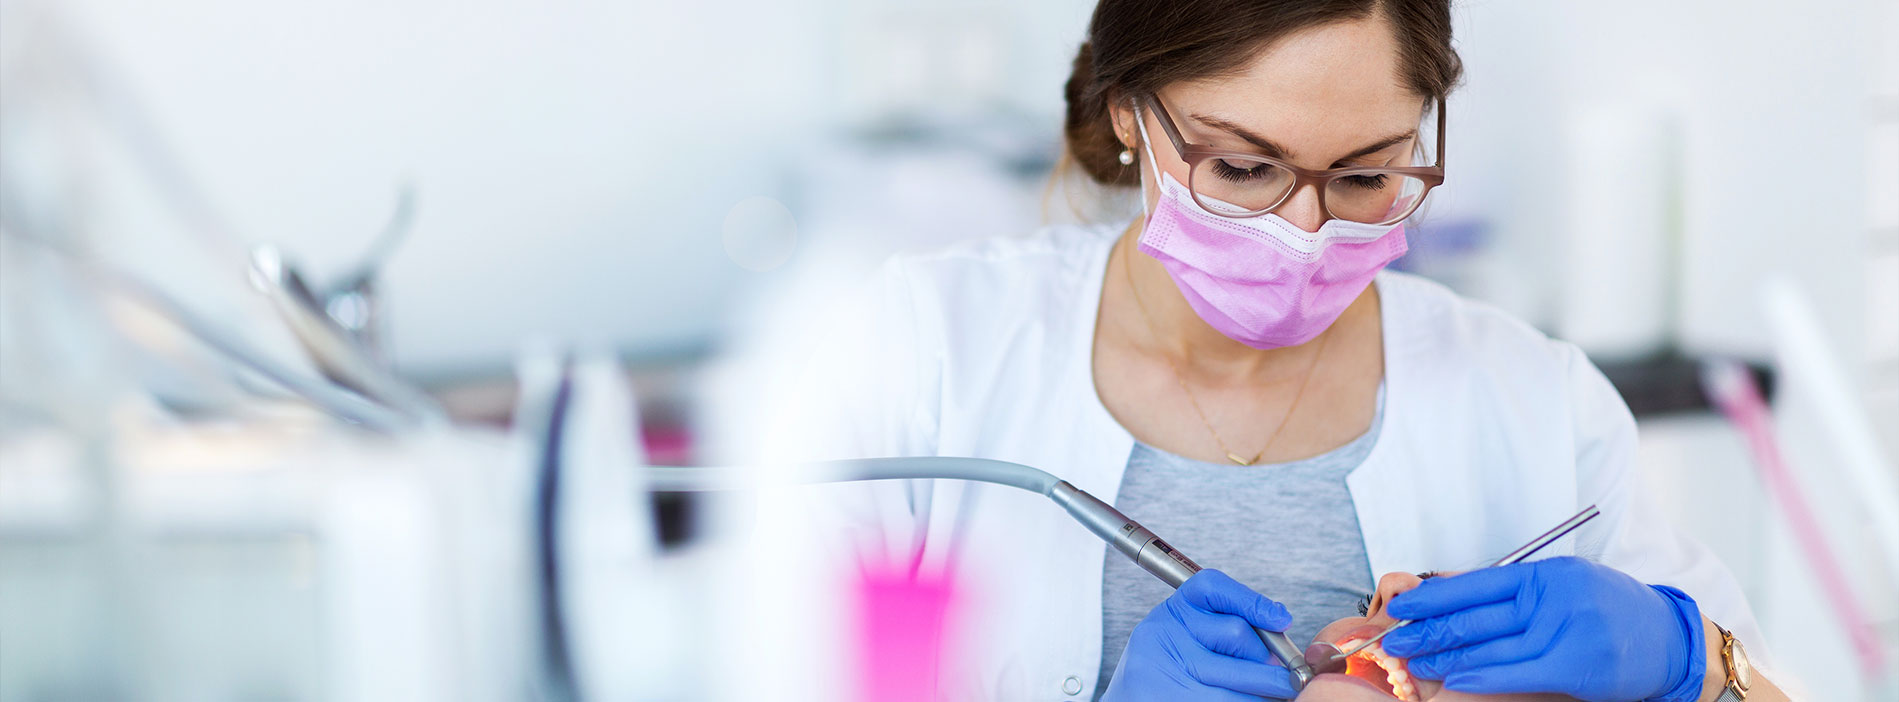 Dentist removing wisdom teeth